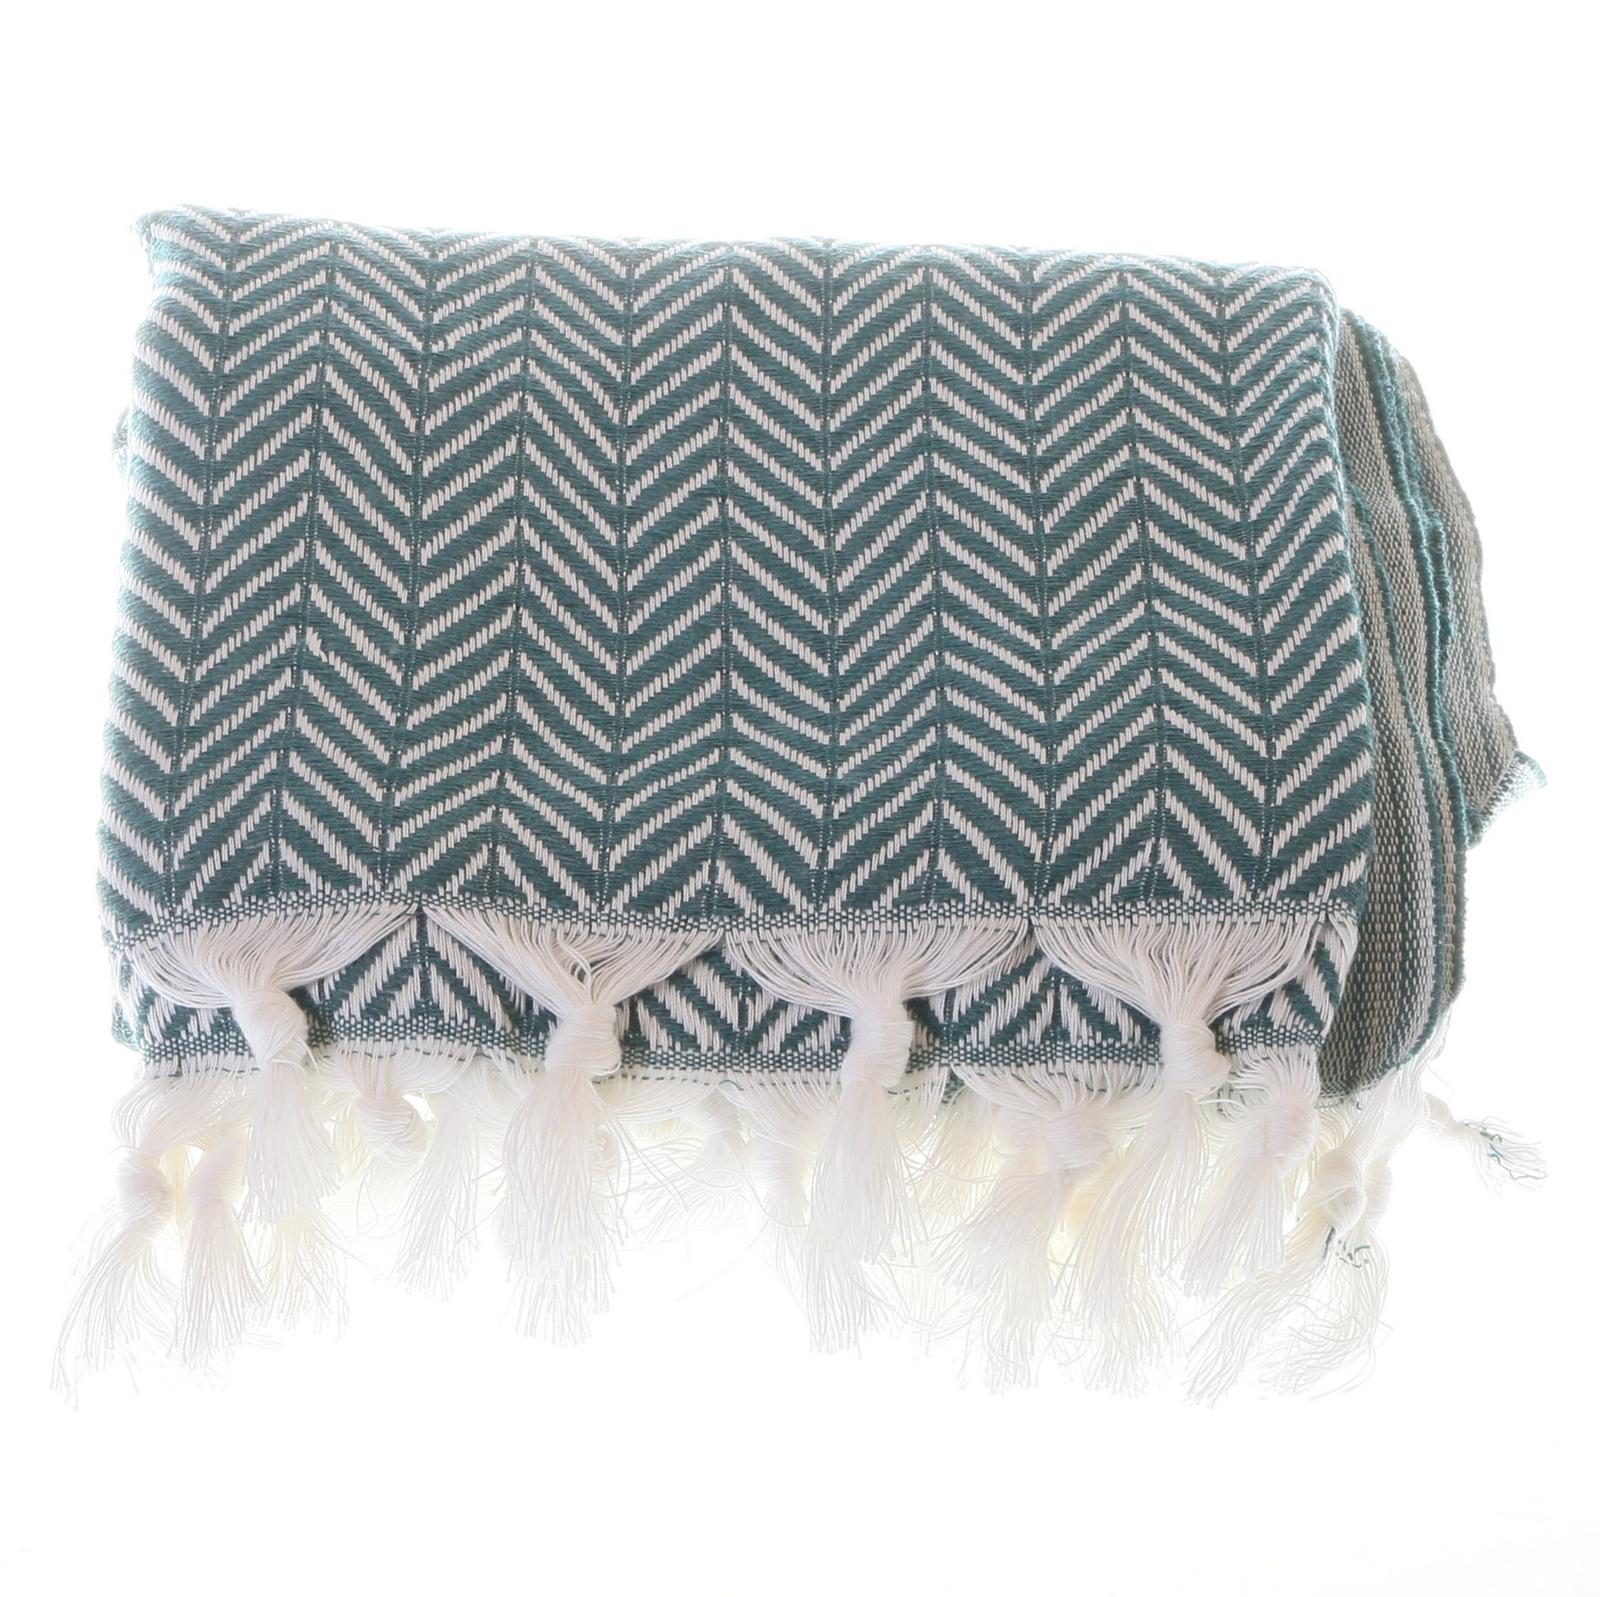 Big zigzag pattern cotton hammam towel - Green